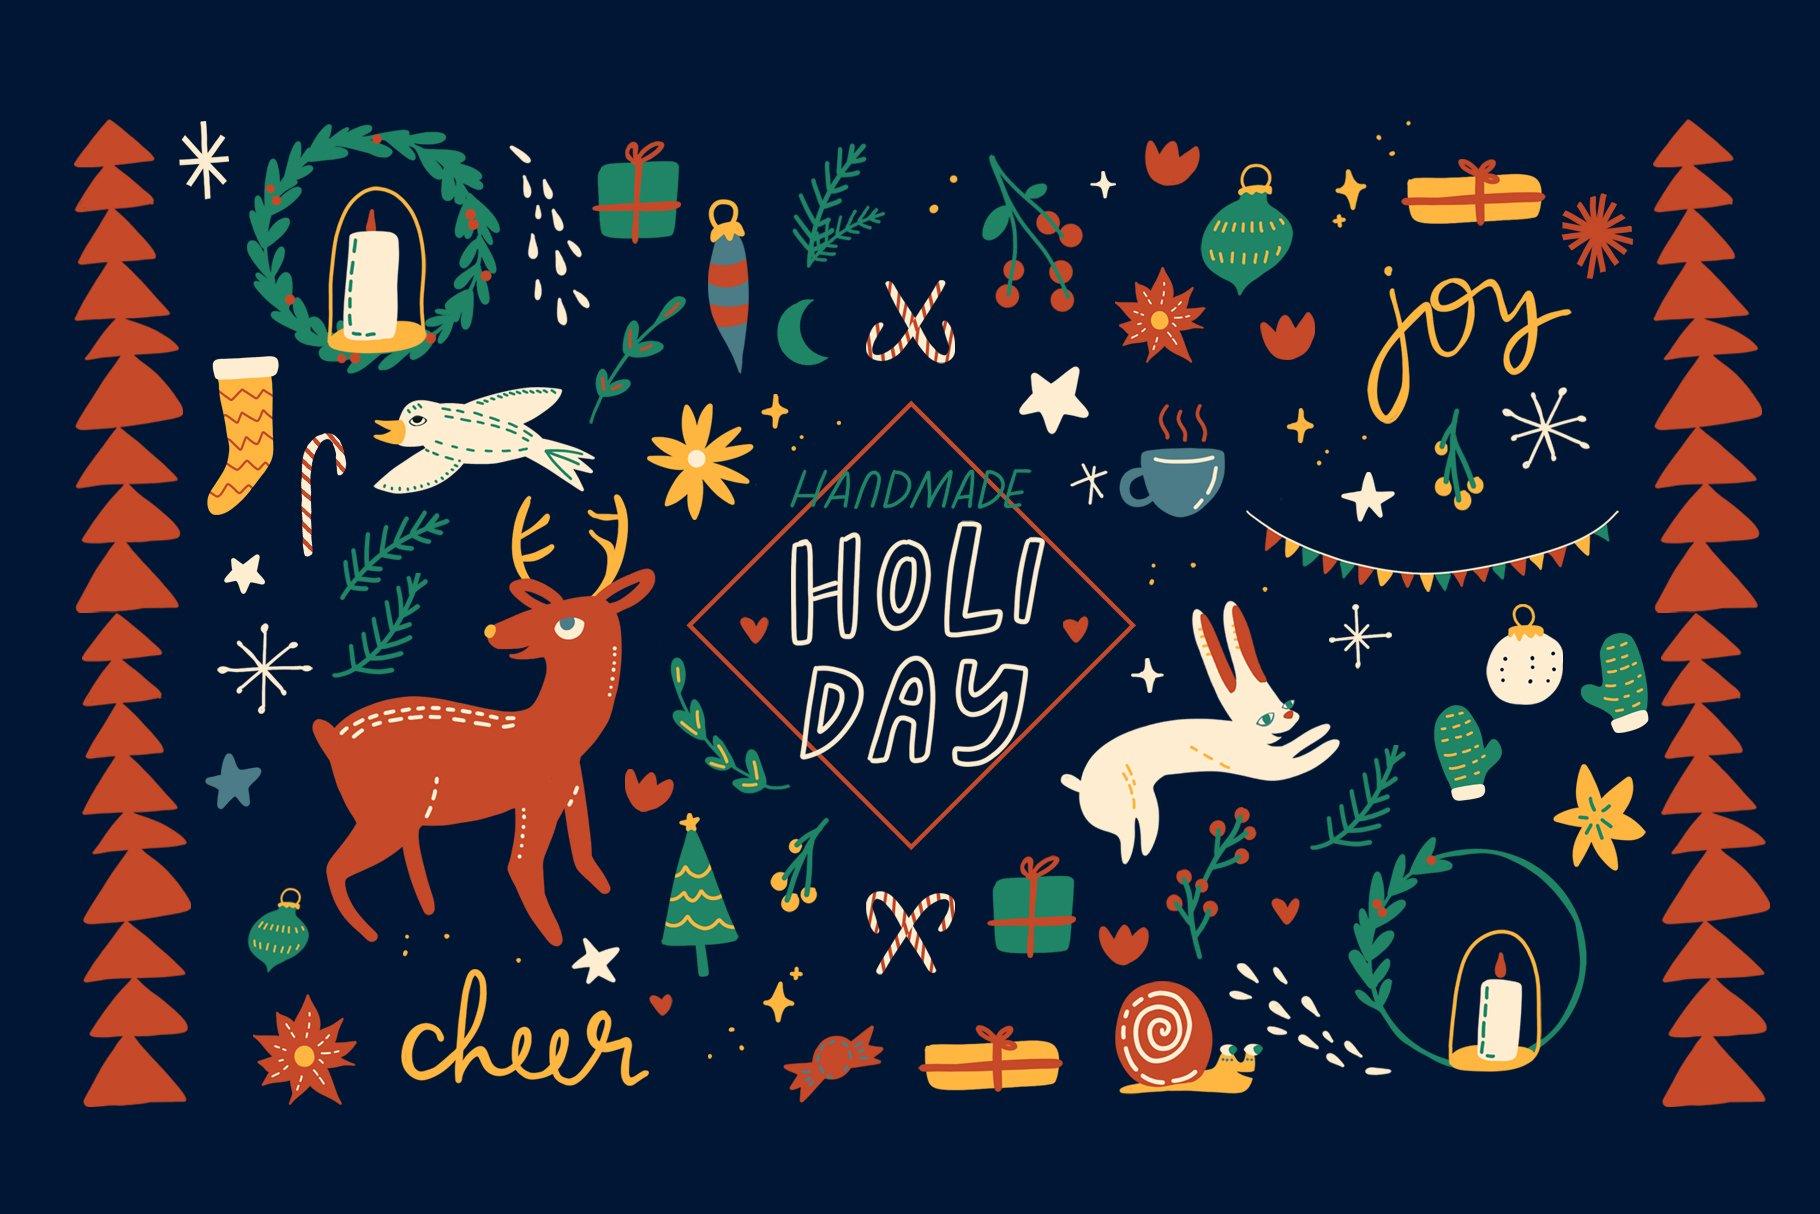 Handmade Holiday Illustrations example image 1